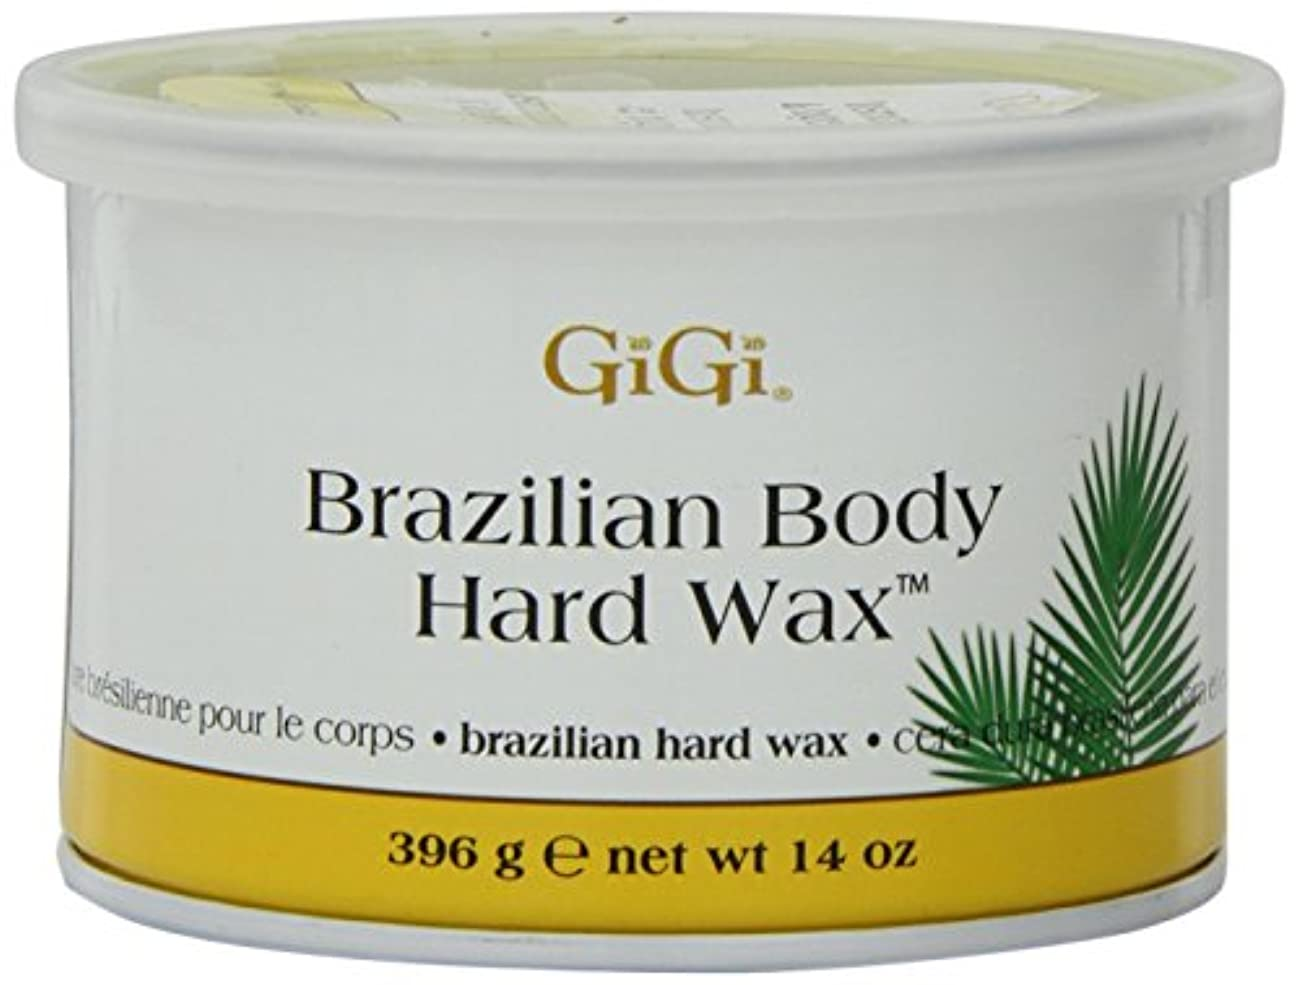 Gigi Tin Brazilian Body Hard Wax 14oz (6 Pack)